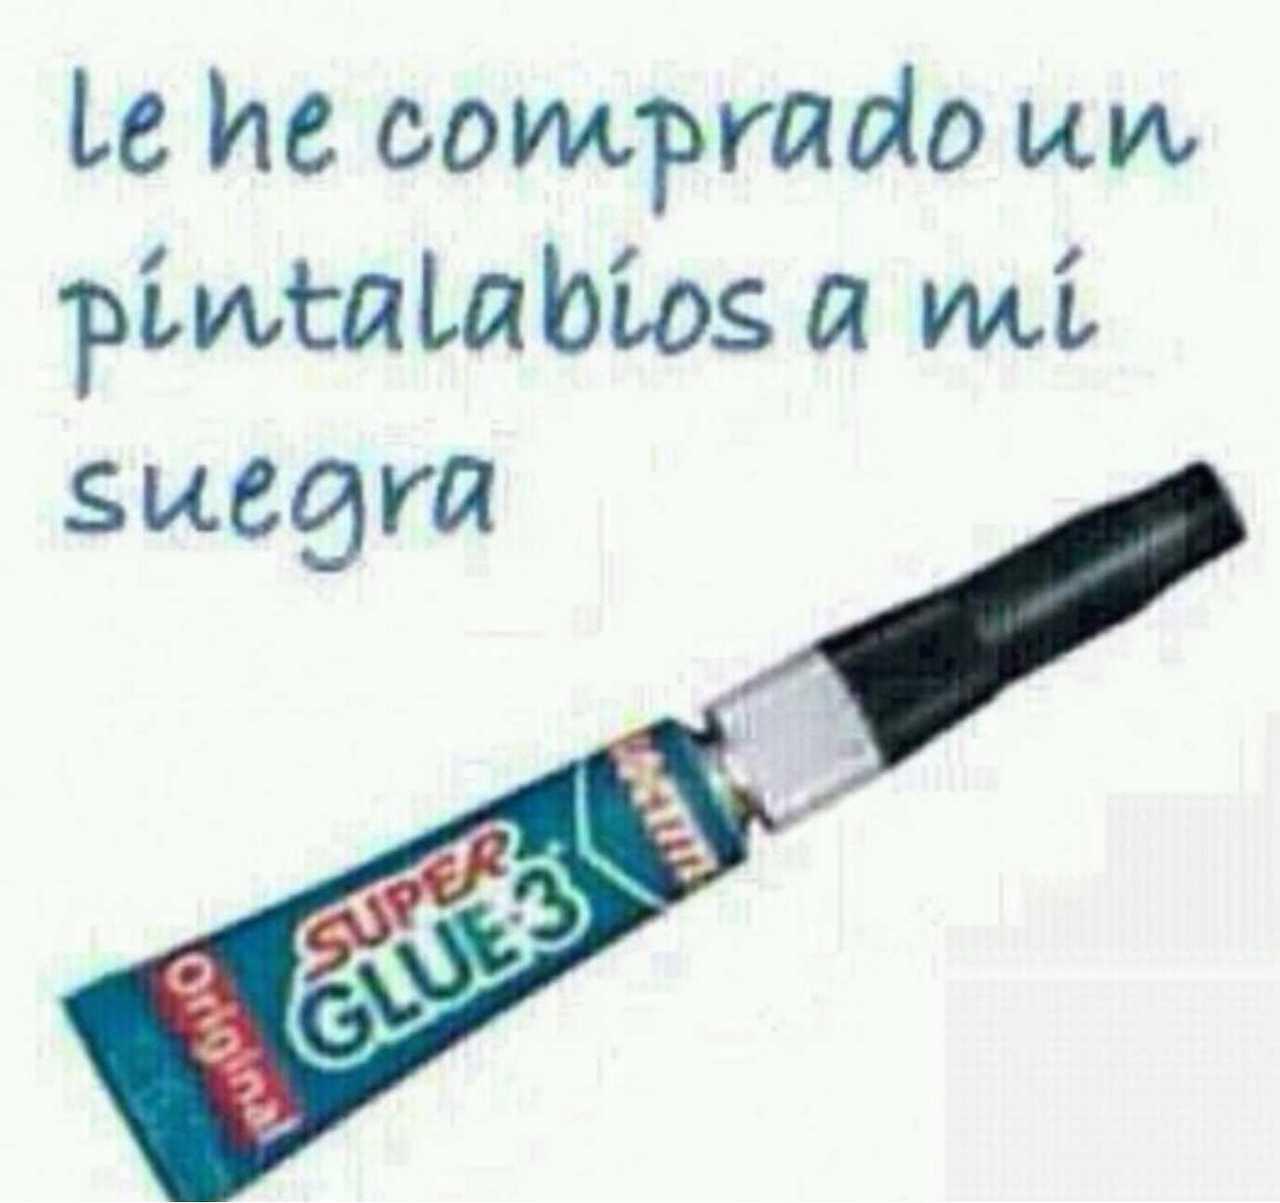 pintalabios-suegra-141442762328971447